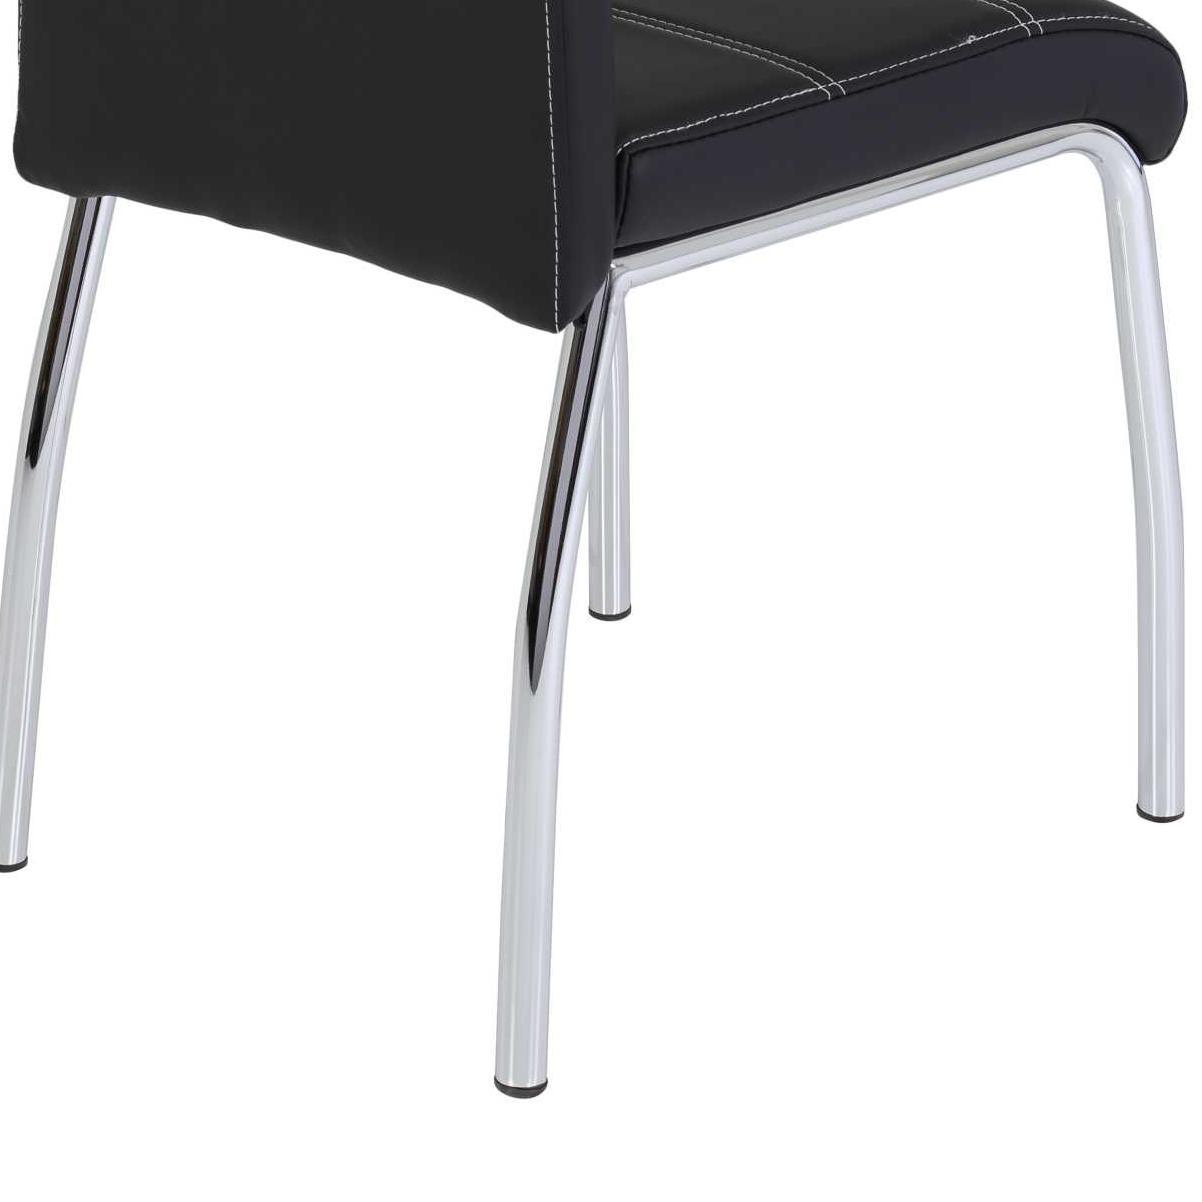 2 Stühle=Set Vierfussstuhl Stuhl Susi S 03 Kunstleder schwarz